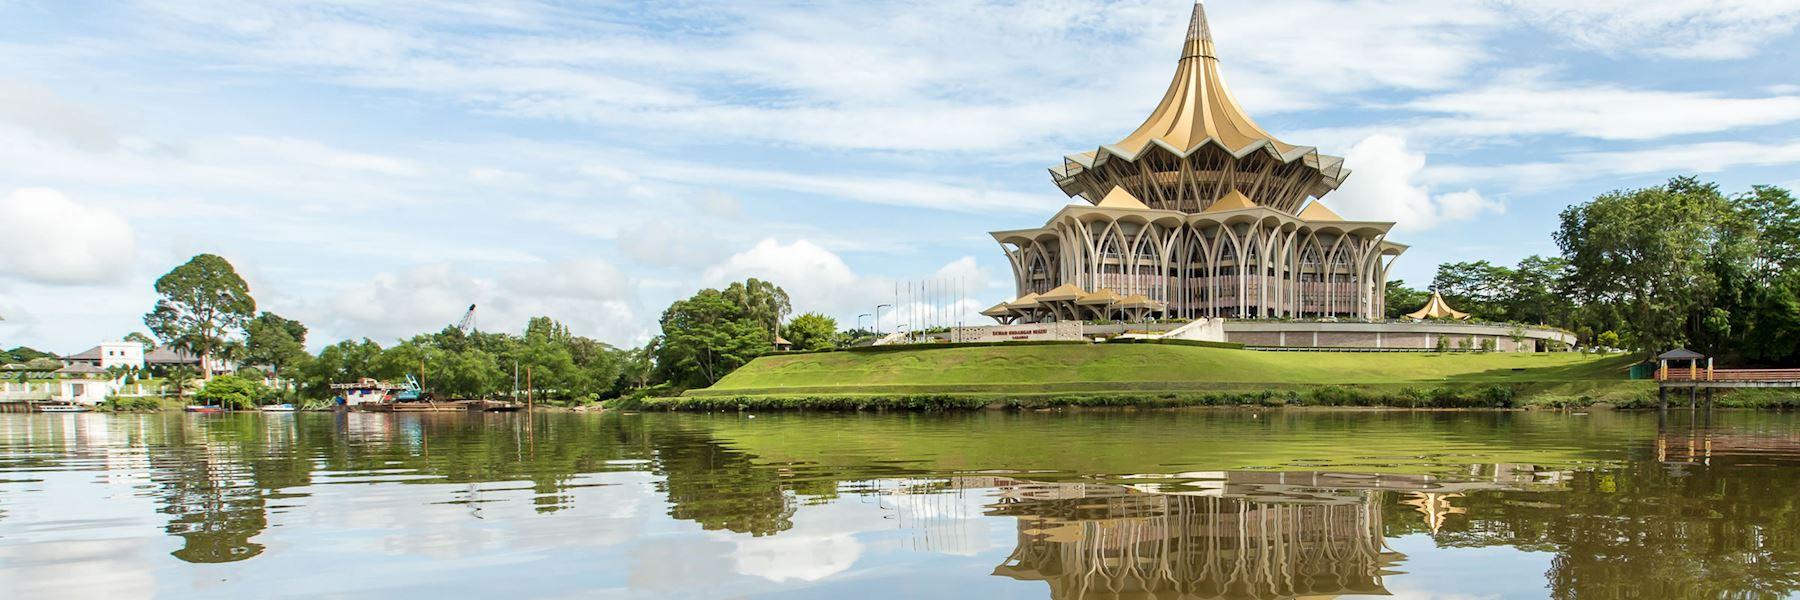 Visit Kuching, Borneo